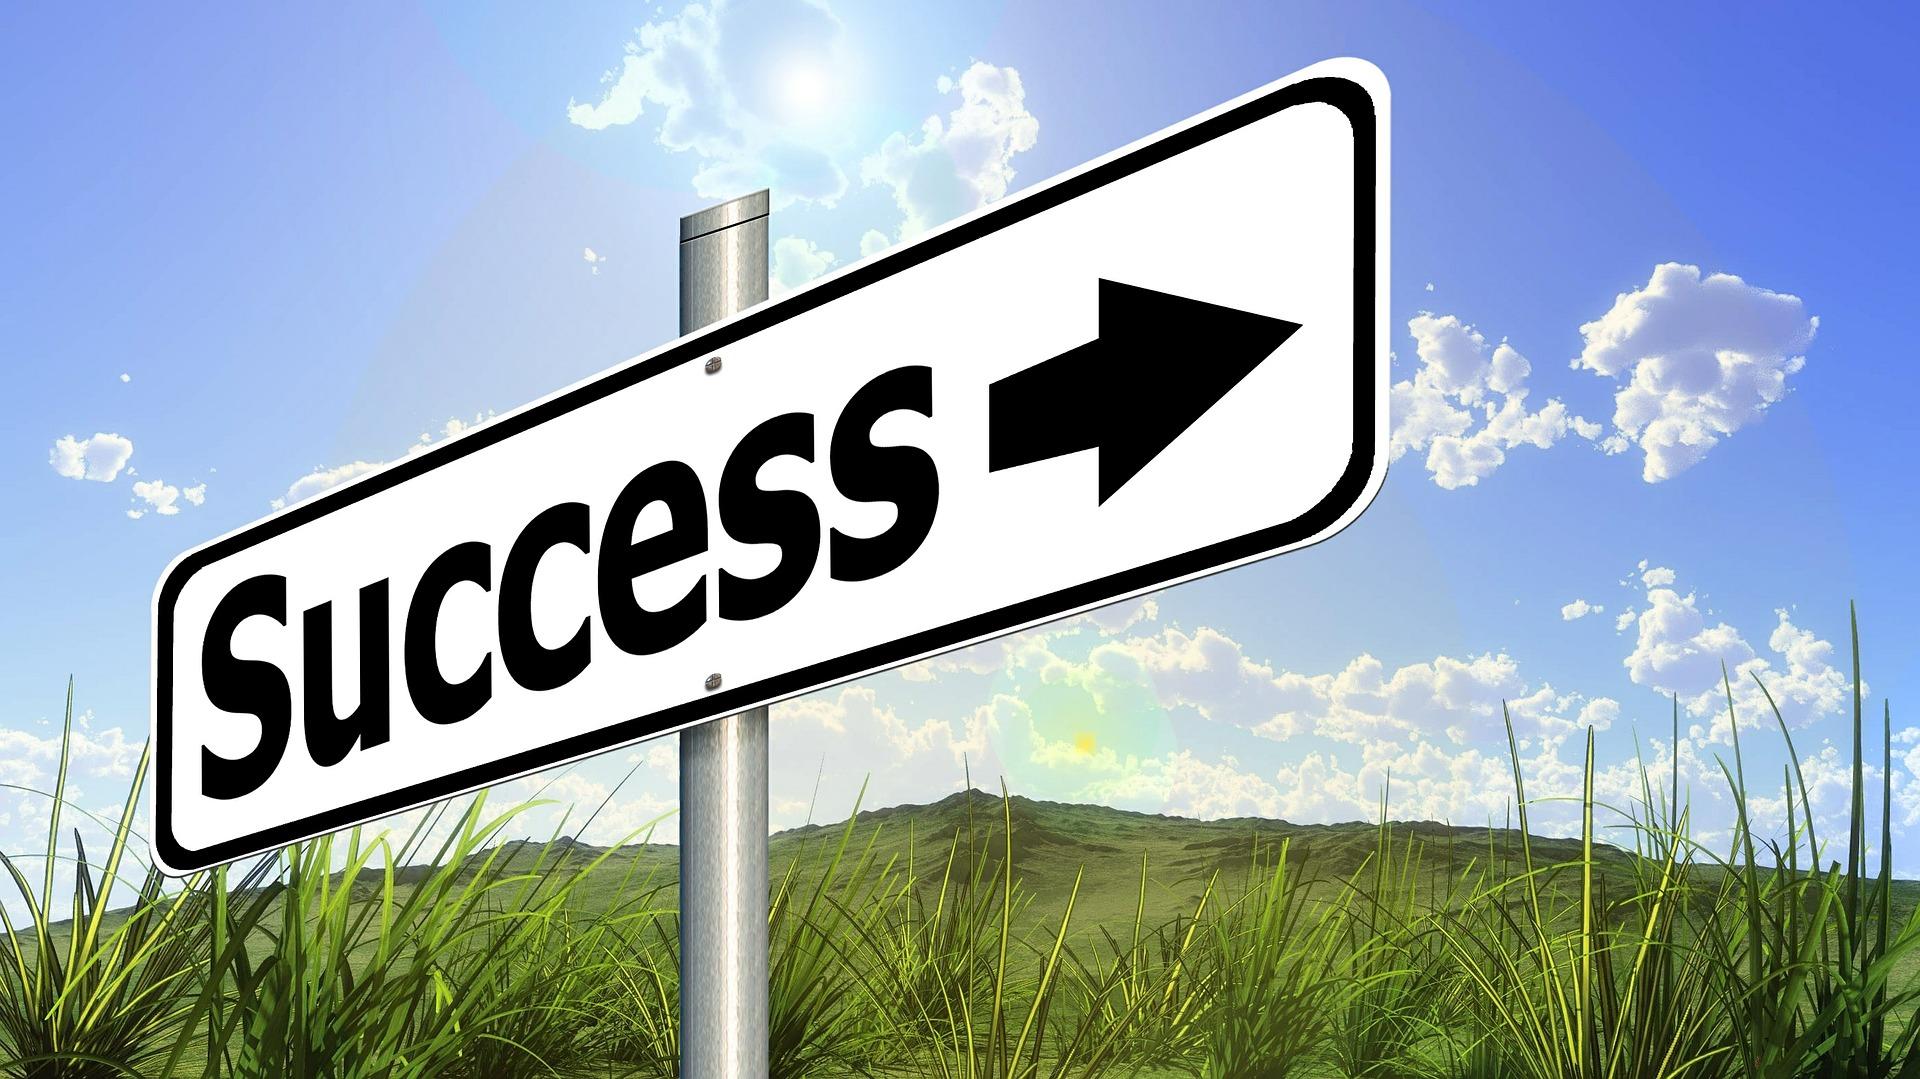 Passion + Mission + Vision = LifeBiz